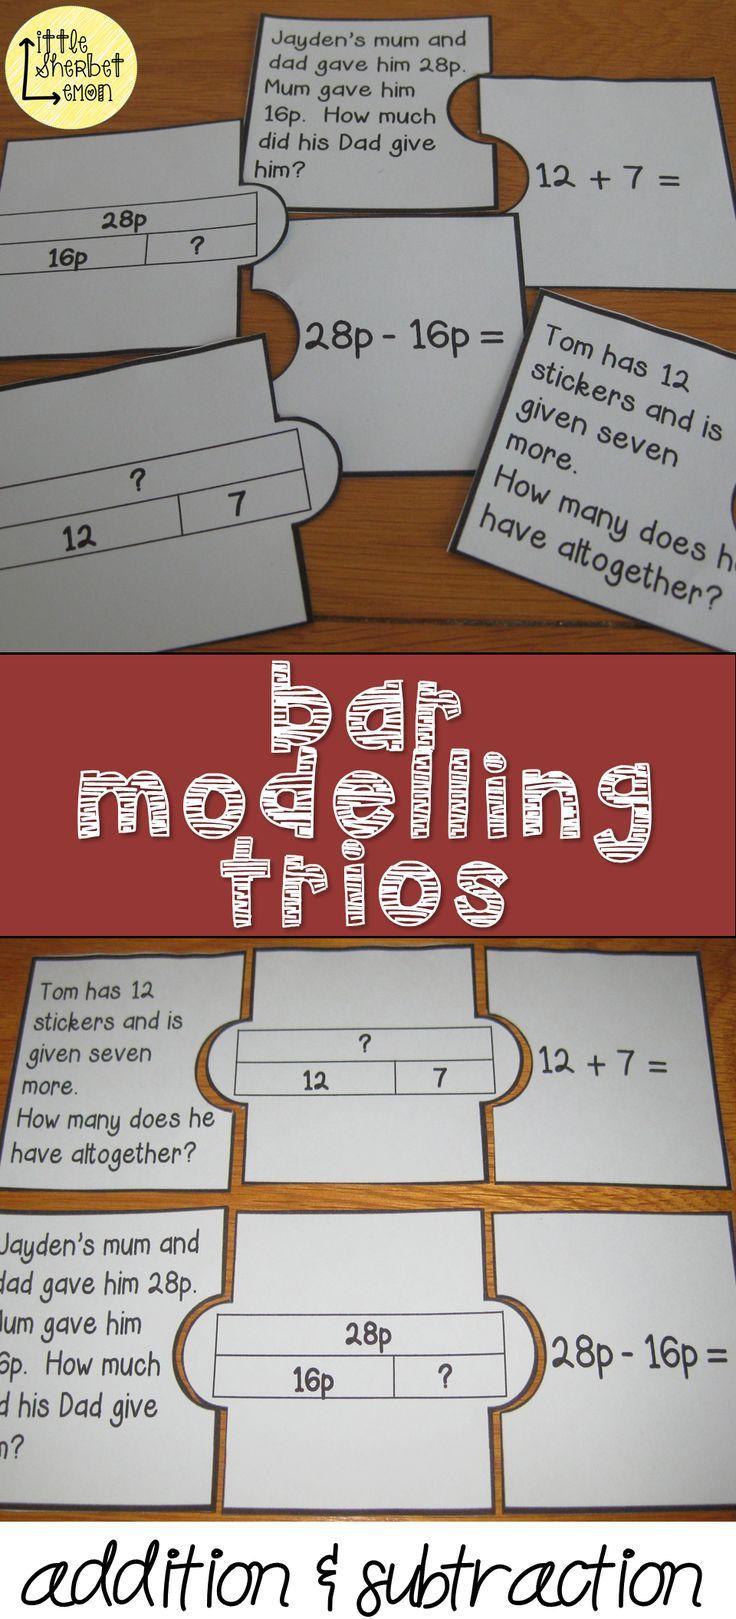 Addition And Subtraction Bar Model Trios Grade 1 2 Addition And Subtraction Bar Model Word Problems Addition and subtraction bar model